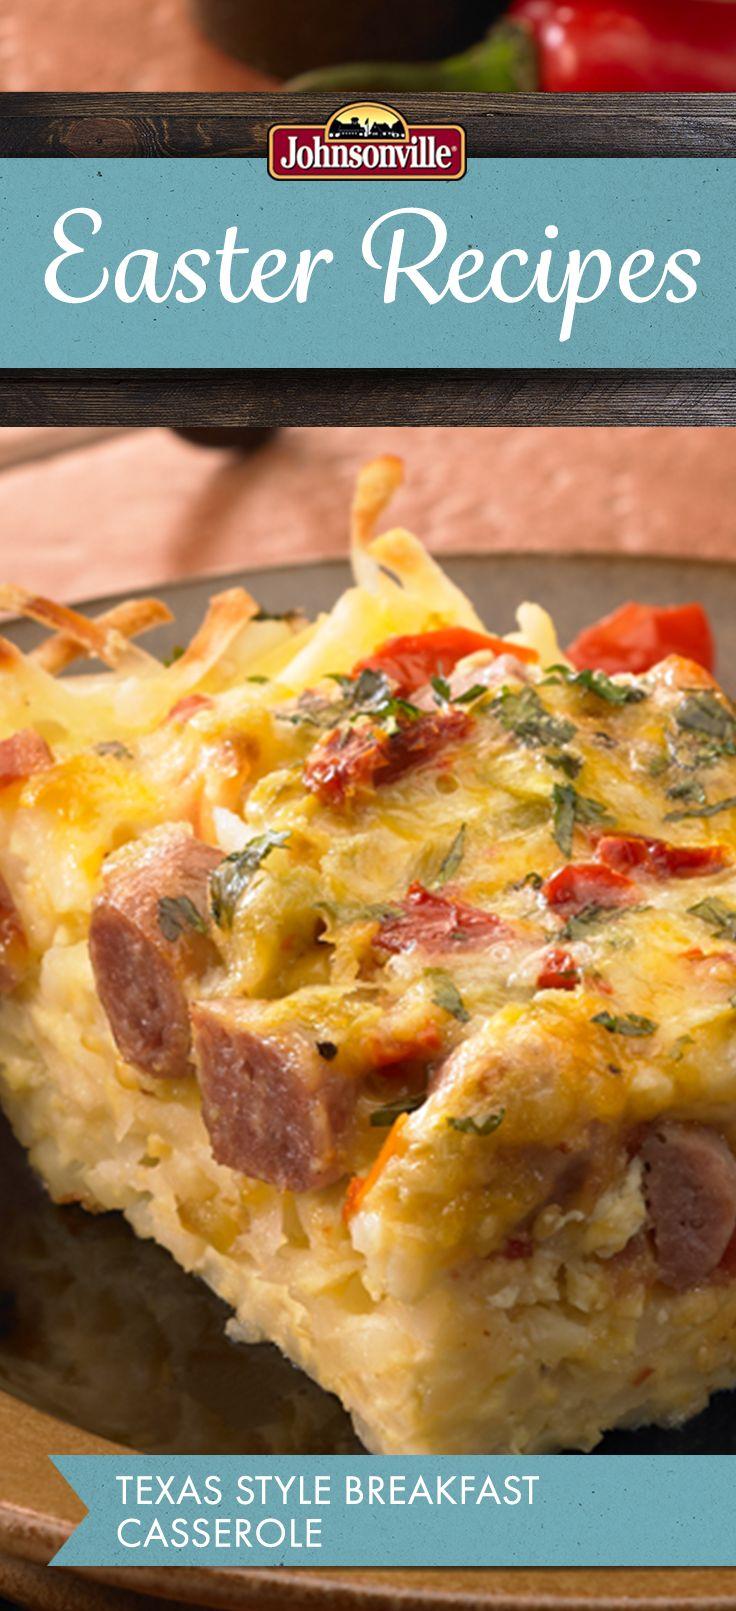 Old fashioned breakfast sausage recipe 46